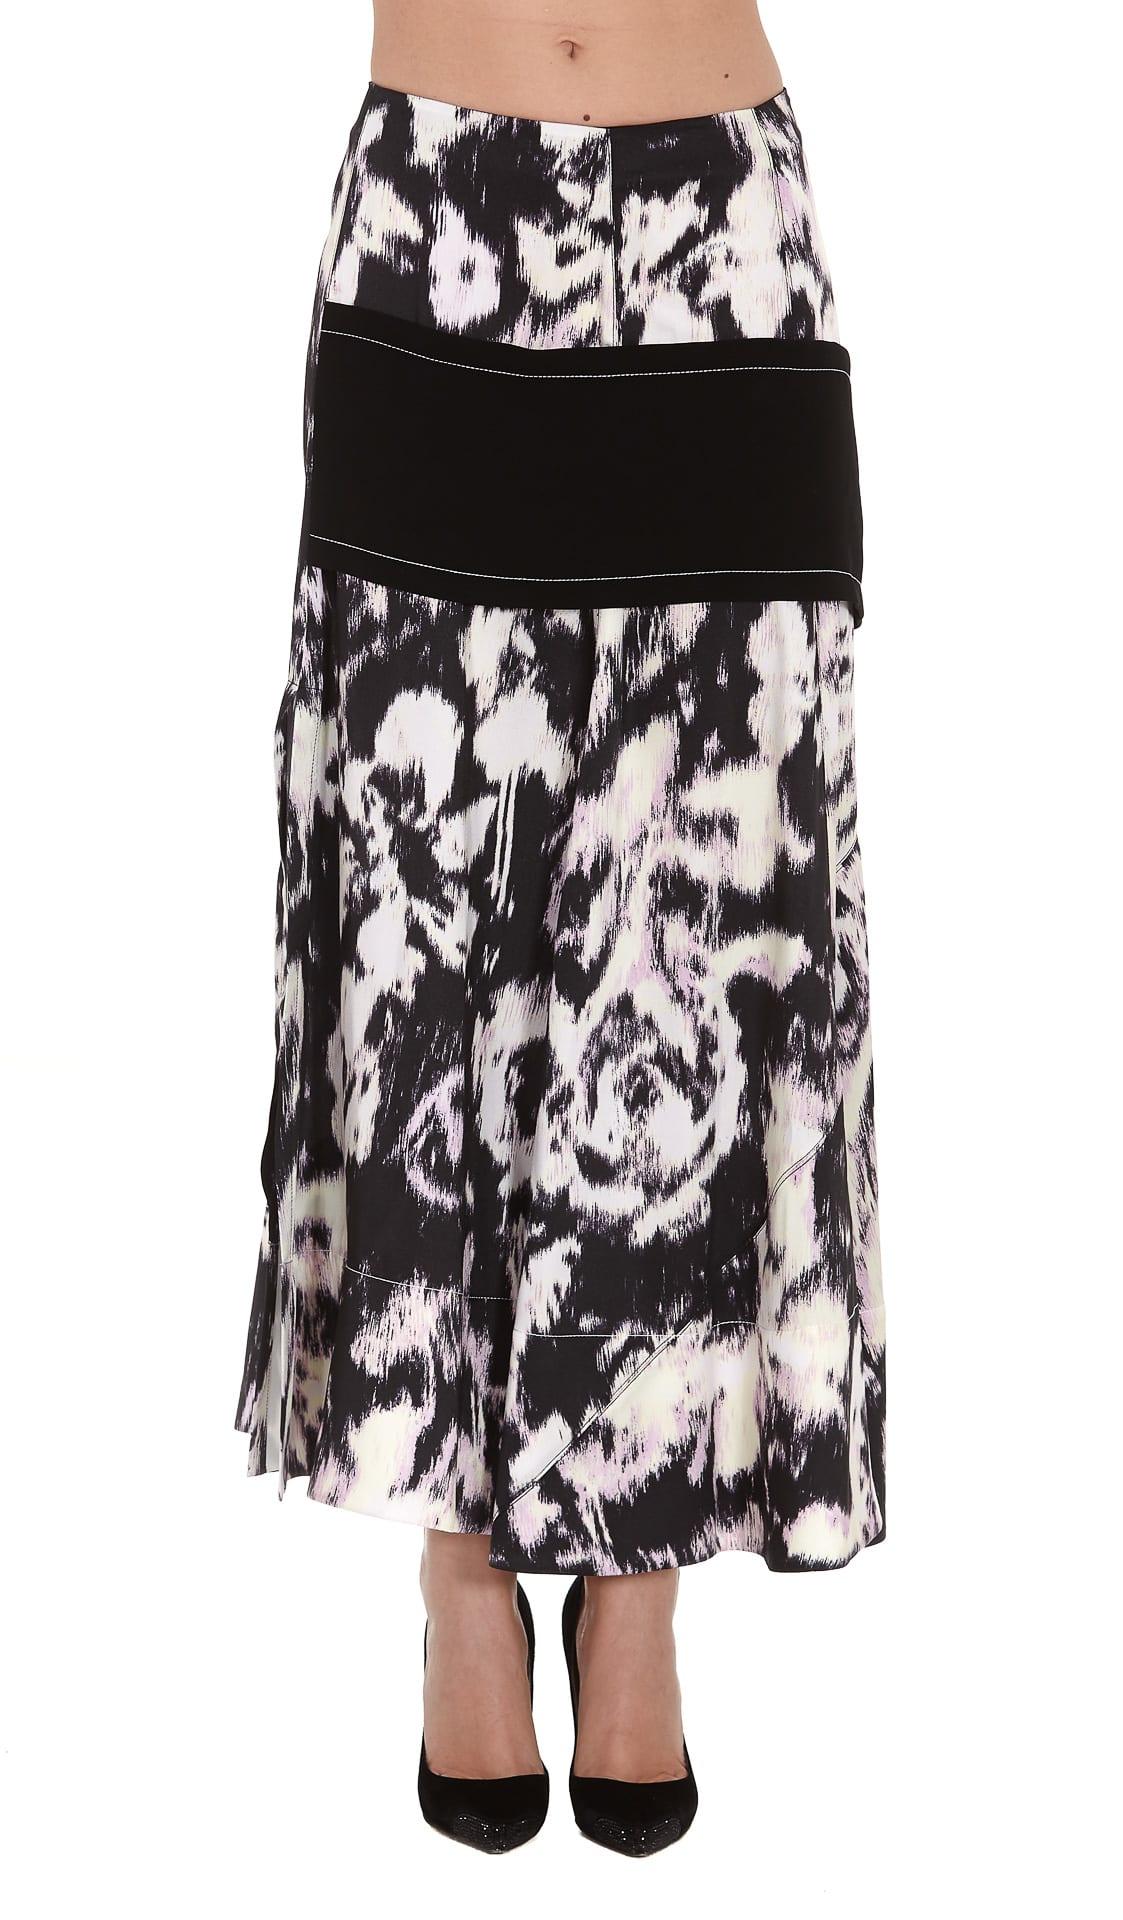 3.1 Phillip Lim Abstract Daisy Layered Skirt